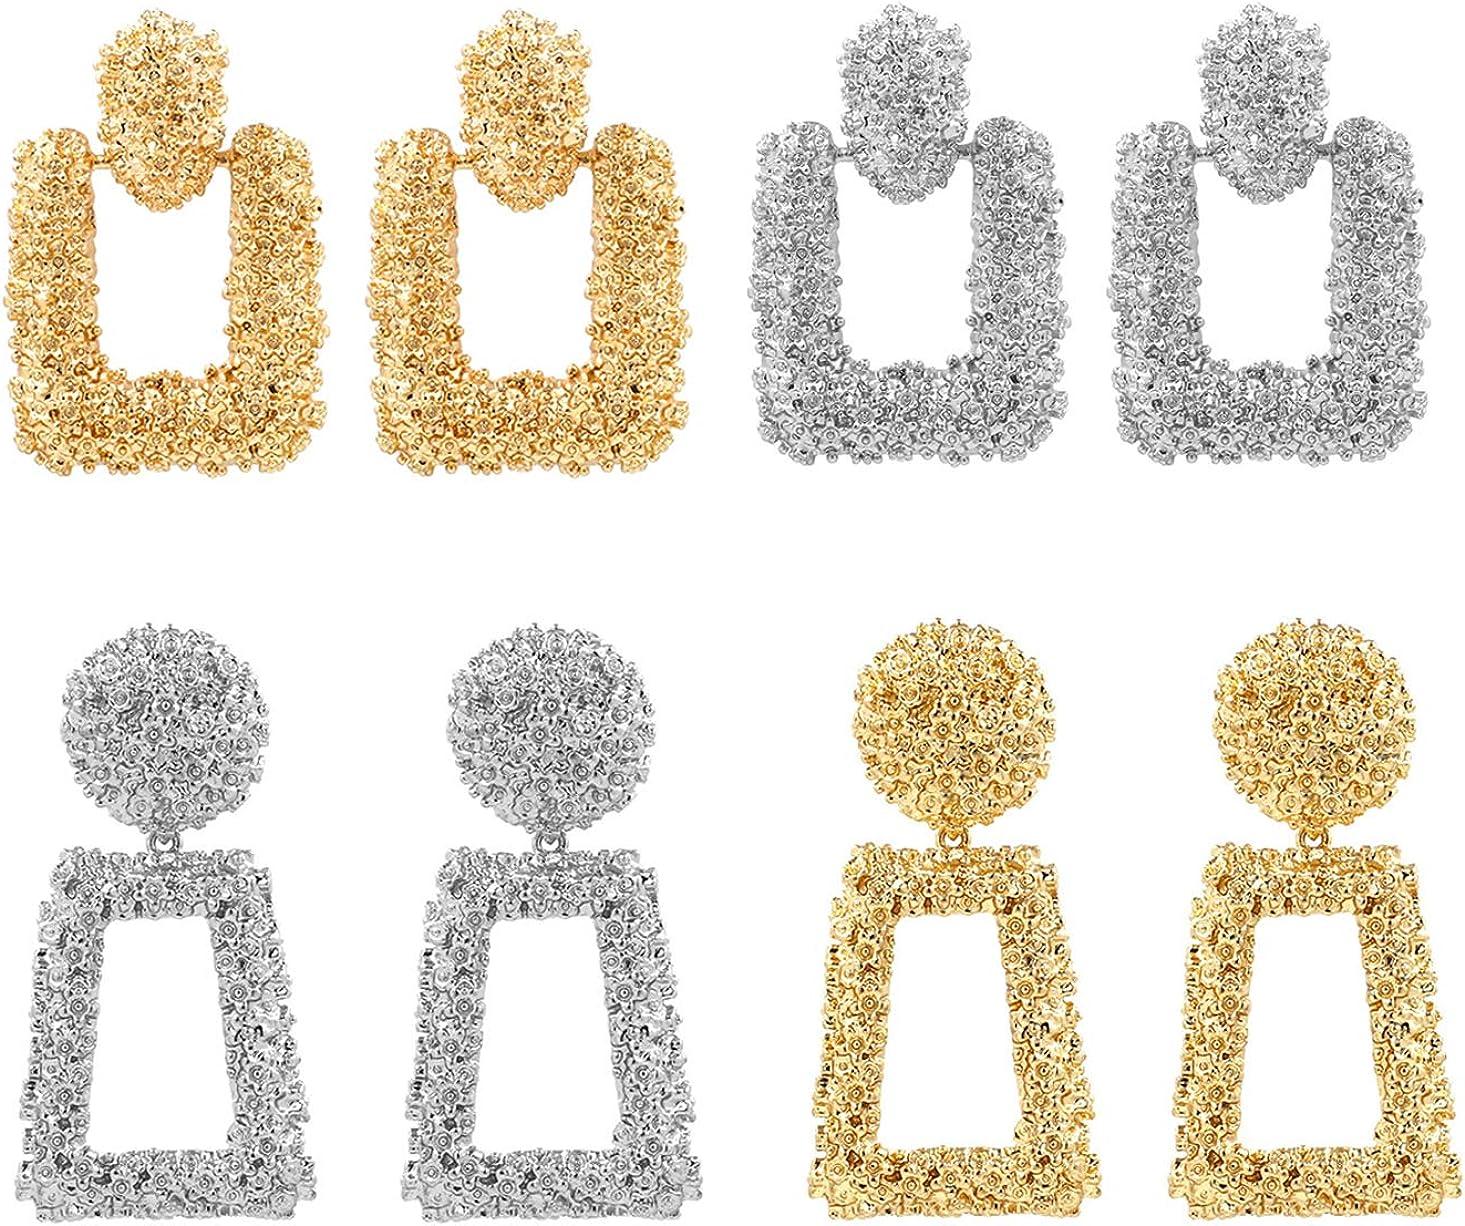 ATIMIGO Statement Drop Earrings Large Metal Geometric Gold Dangle Drop Earrings for Women Girls